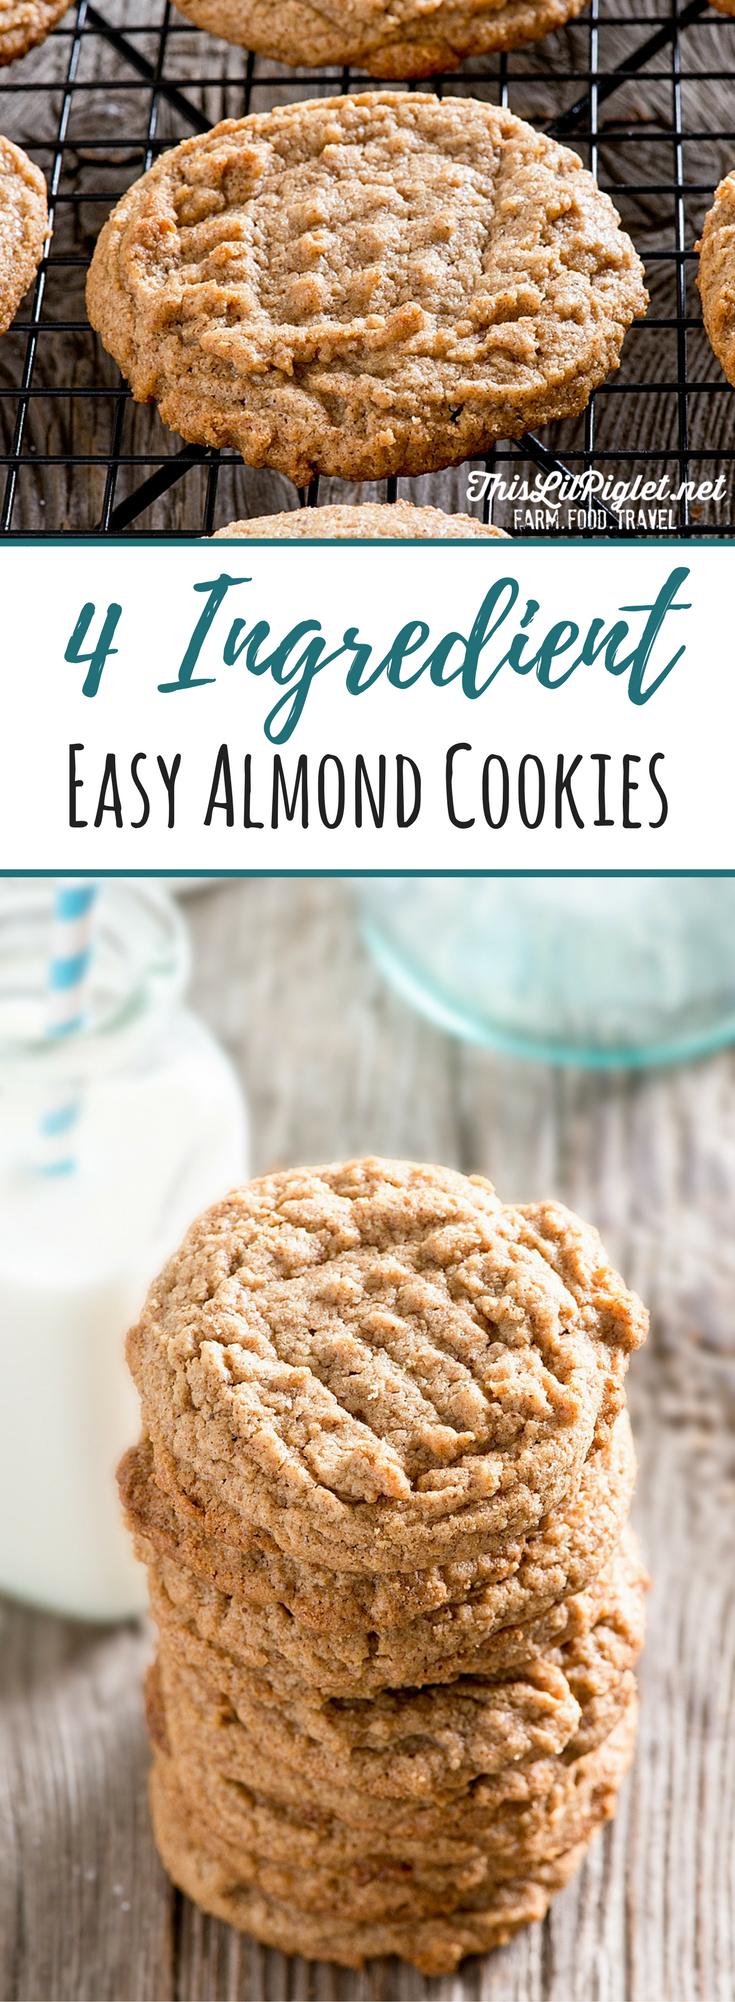 4 Ingredient Easy Almond Cookies PIN // thislilpiglet.net